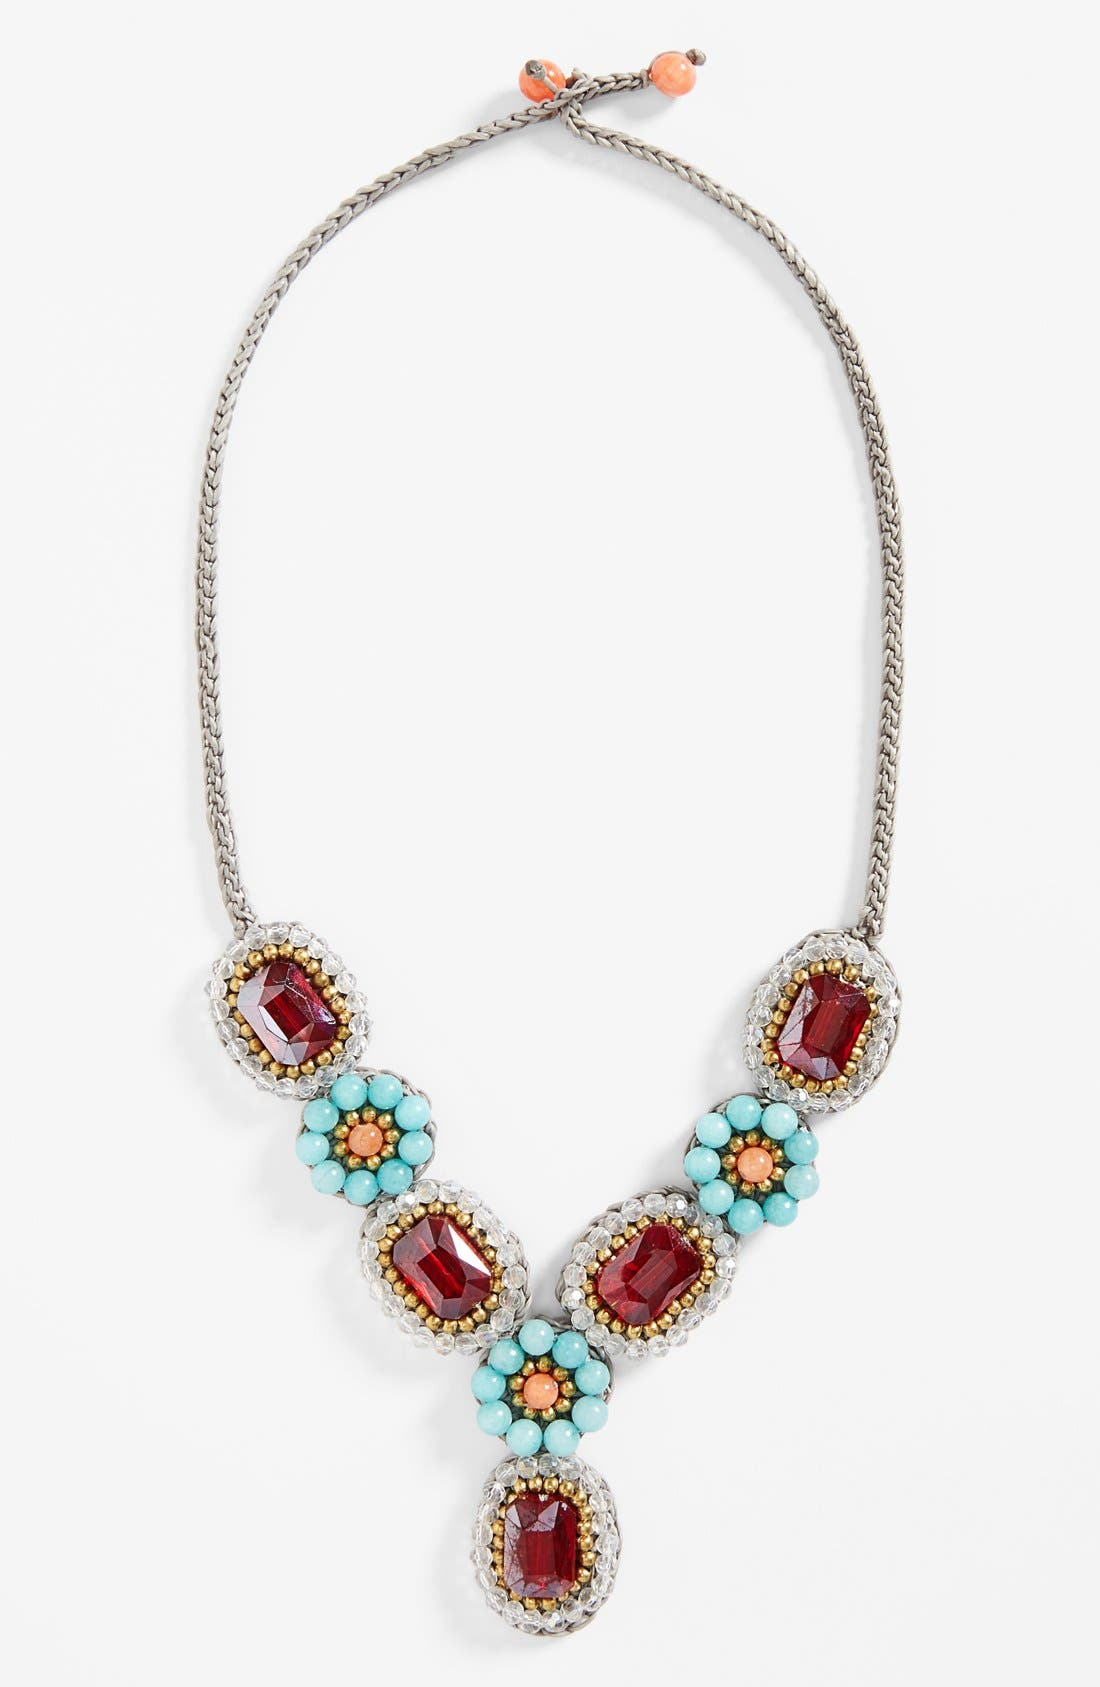 Main Image - Panacea Crystal Quartz Statement Necklace